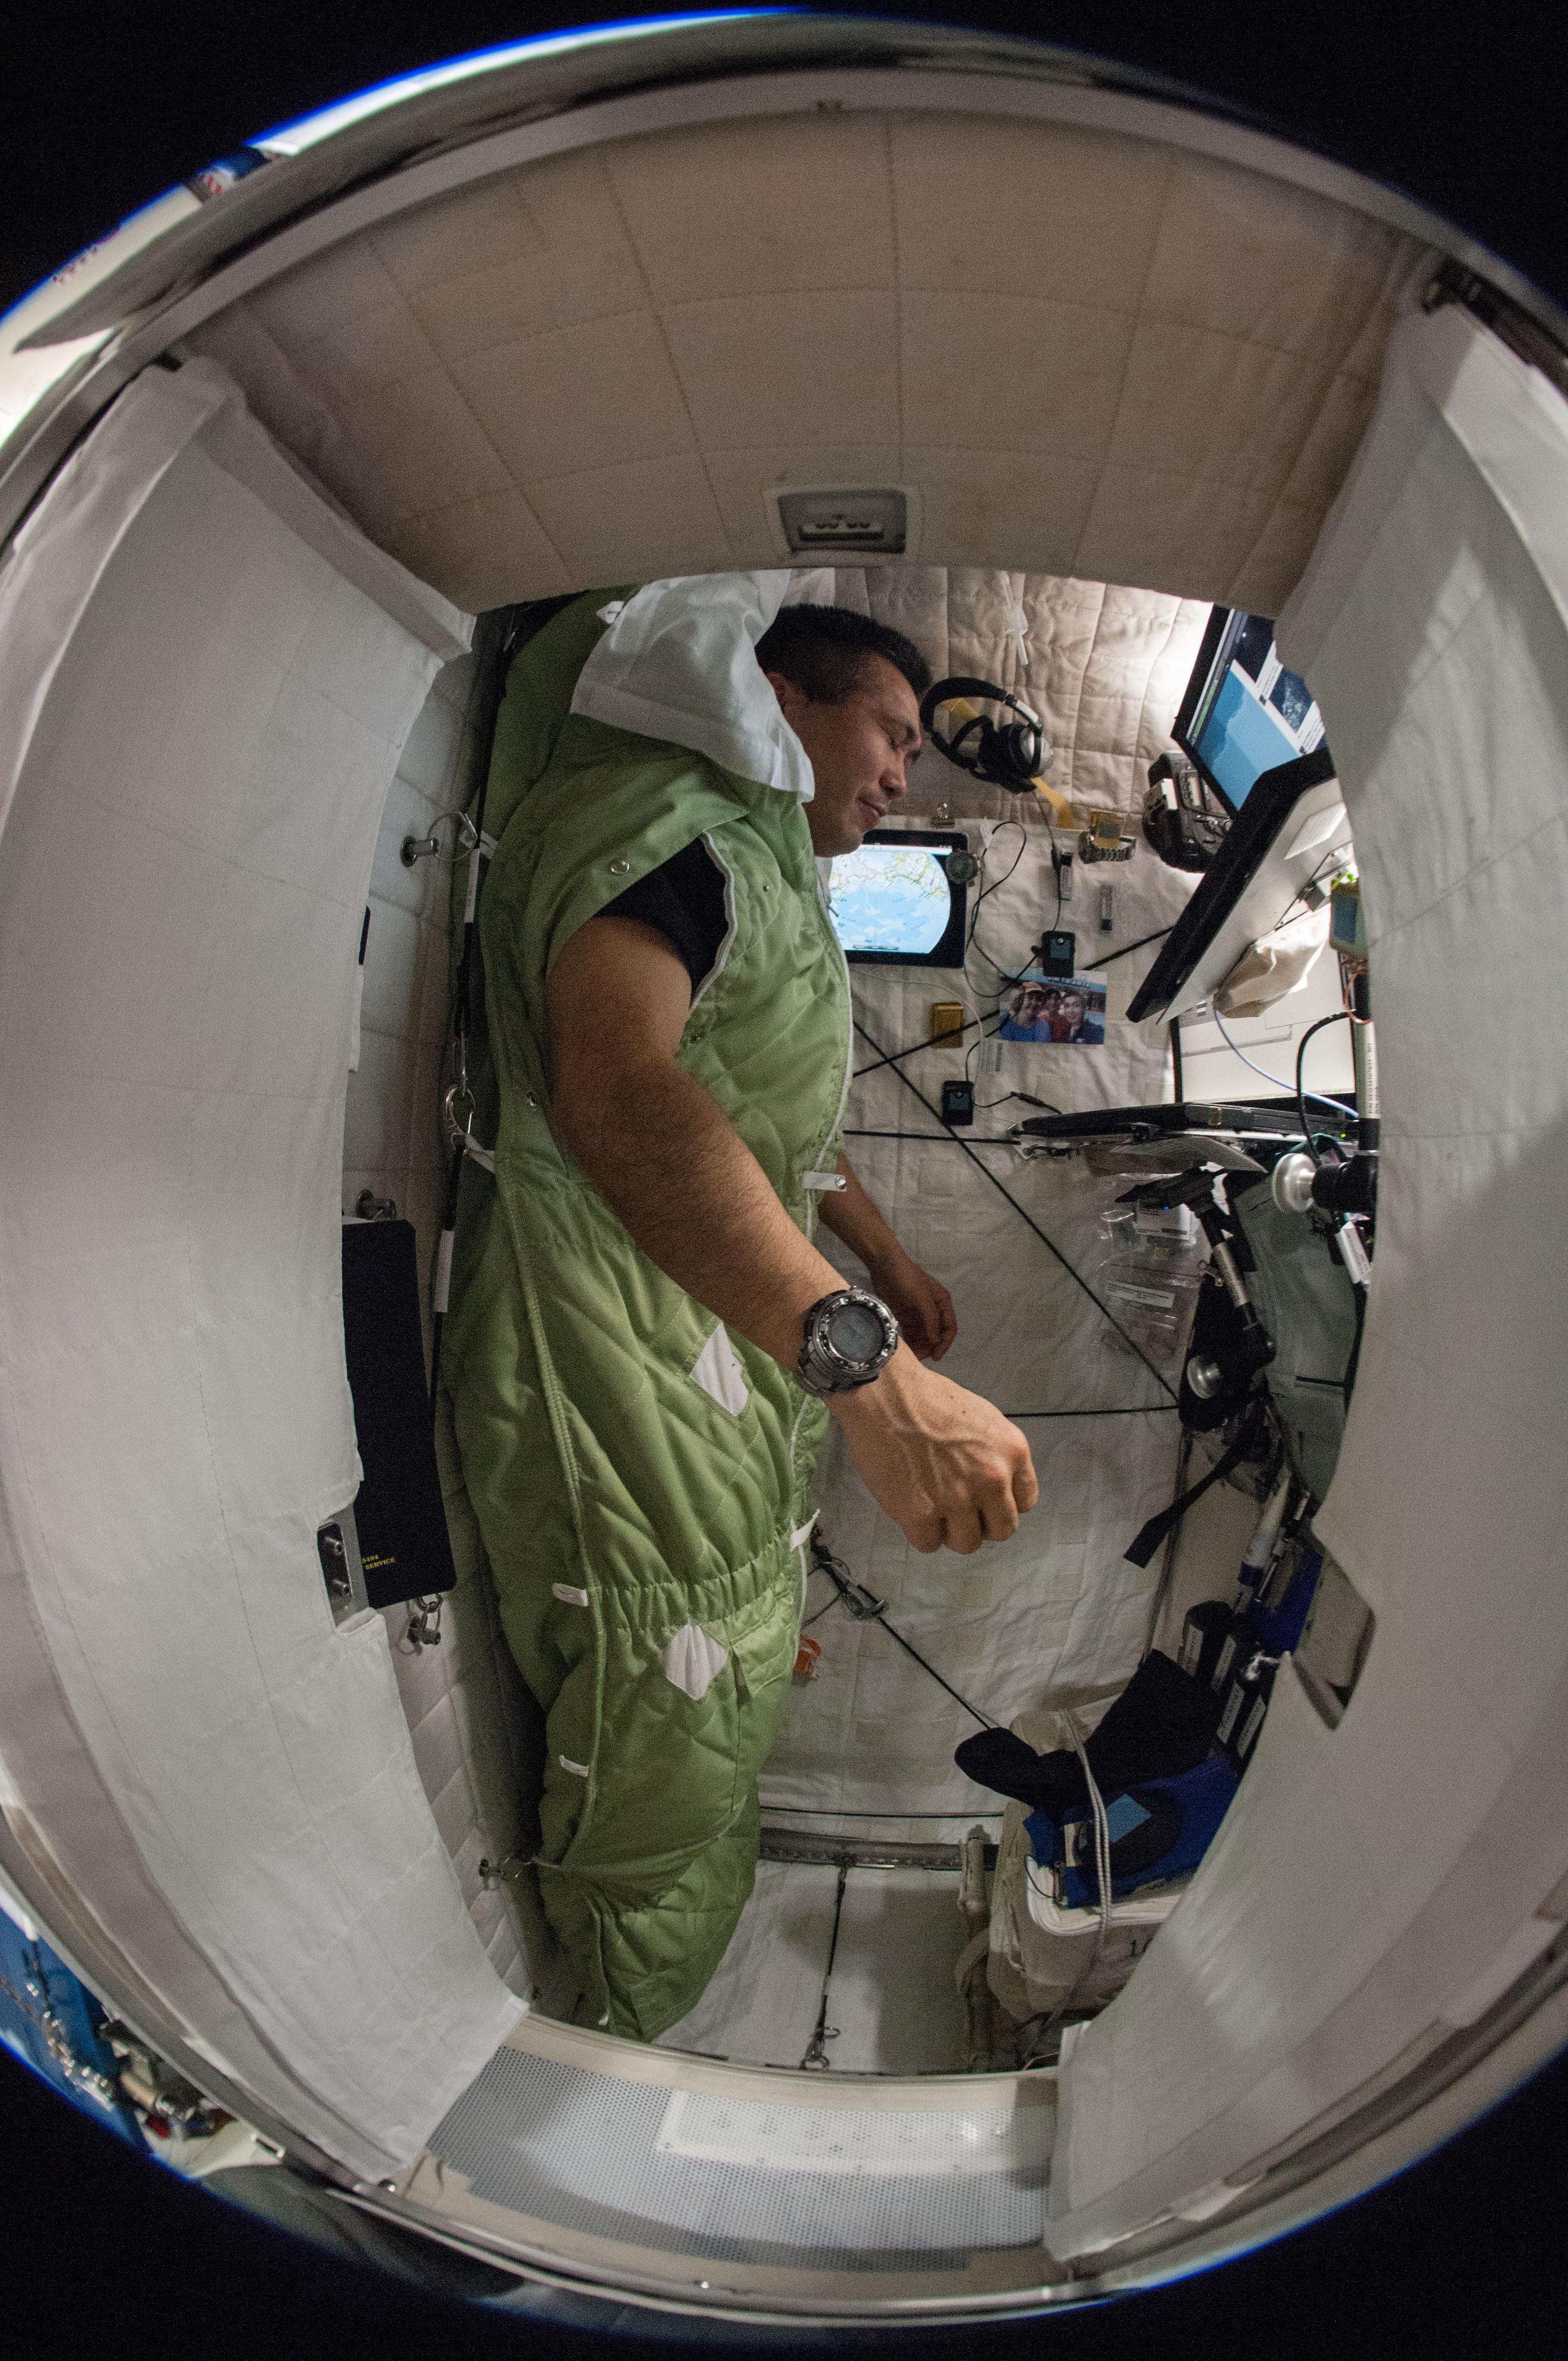 Get a good night's sleep, astronaut-style